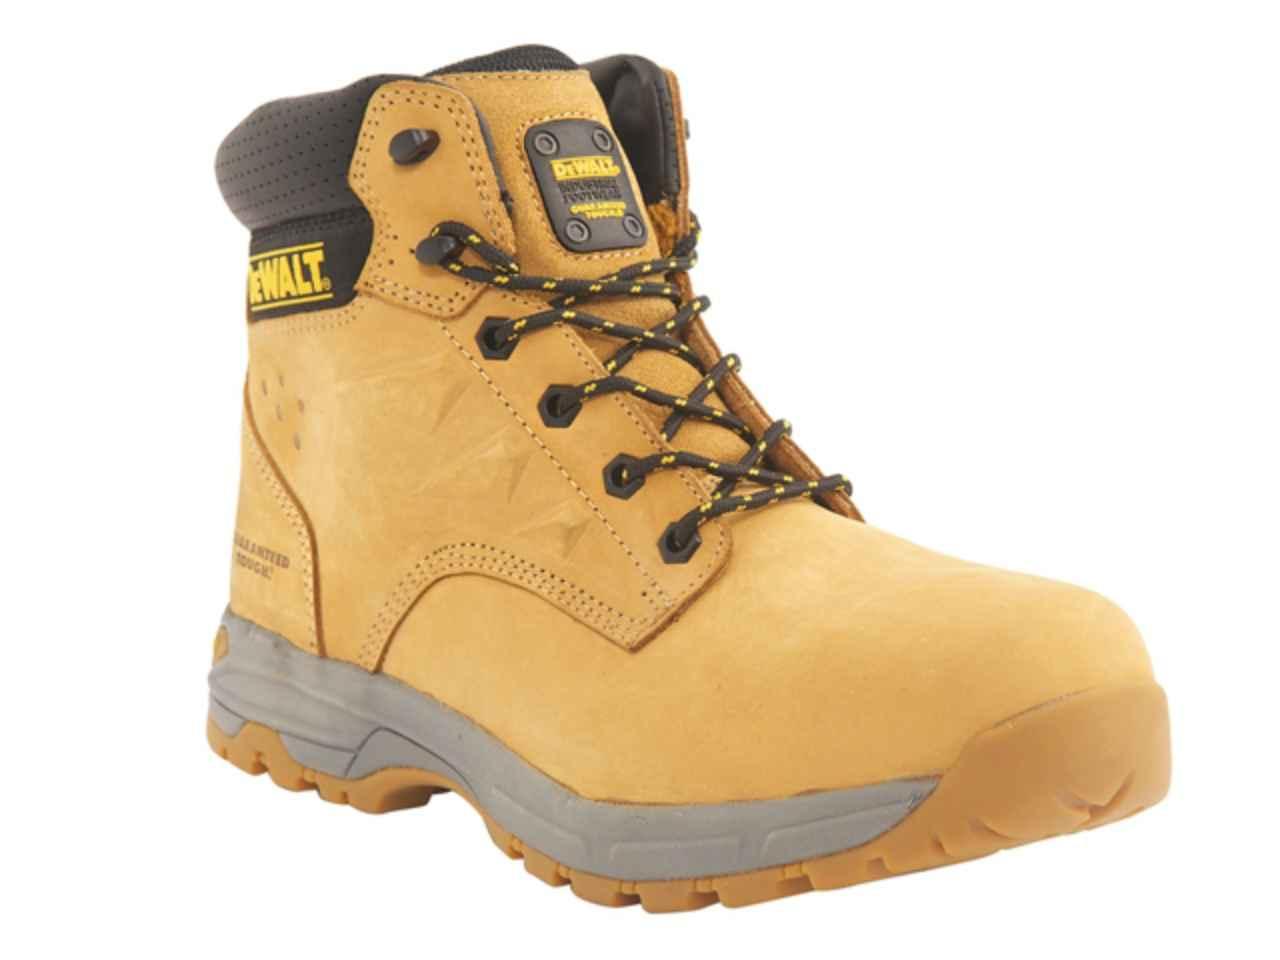 e3ebdda5285 DeWalt Carbon SBP Safety Boots Various Colours and Sizes